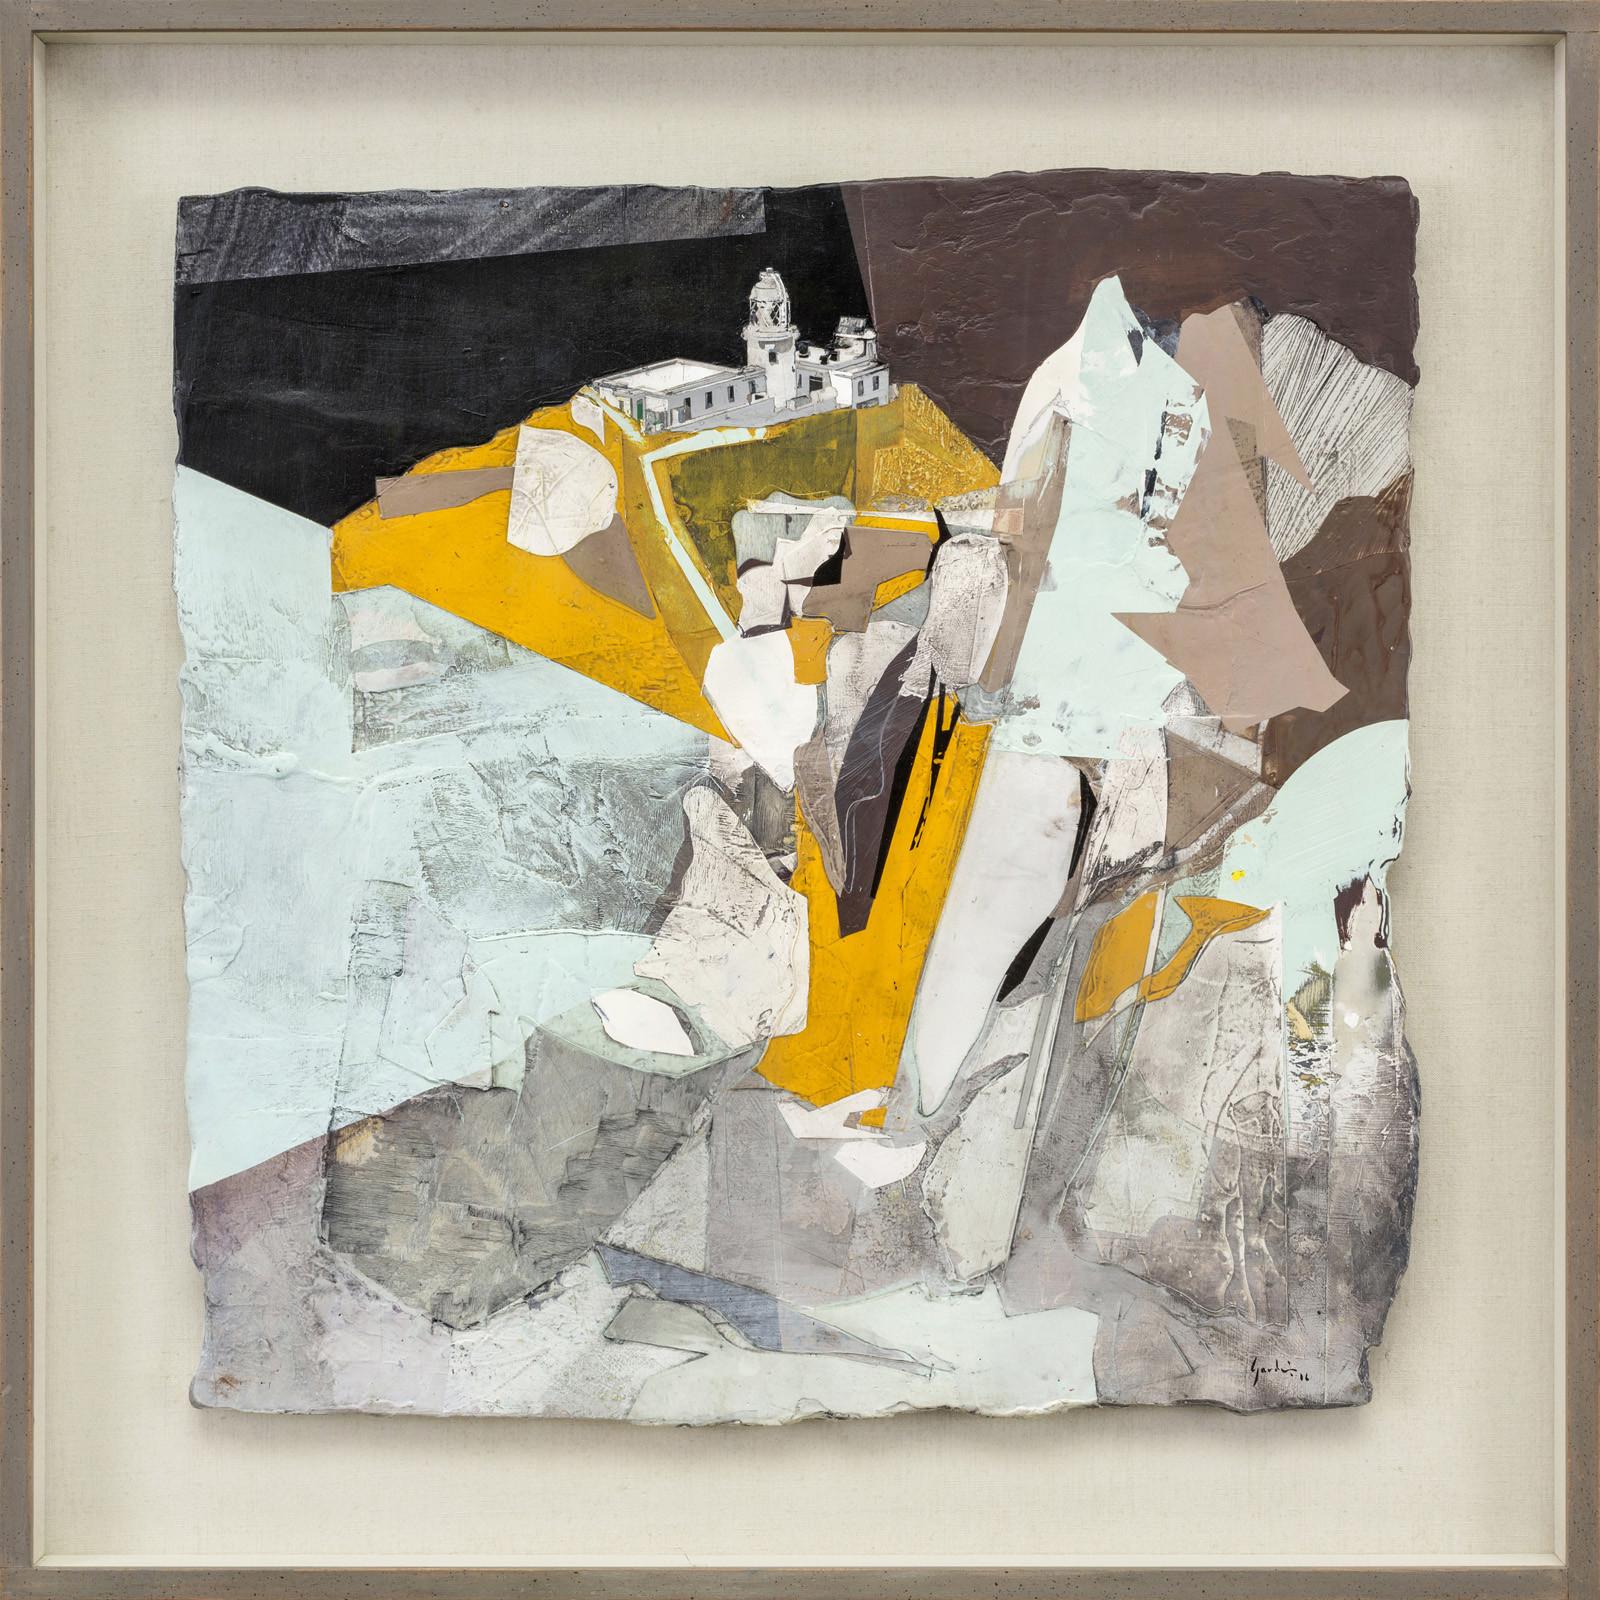 <span class=&#34;link fancybox-details-link&#34;><a href=&#34;/artists/47-jeremy-gardiner/works/704/&#34;>View Detail Page</a></span><div class=&#34;artist&#34;><strong>Jeremy Gardiner</strong></div> Born 1957 <div class=&#34;title&#34;><em>Summer Solstice, Lundy North Lighthouse</em></div> <div class=&#34;signed_and_dated&#34;>signed and dated 2016<br /> titled verso  </div> <div class=&#34;medium&#34;>acrylic and jesmonite on poplar panel</div> <div class=&#34;dimensions&#34;>61 x 61cms (24 x 24ins)</div>